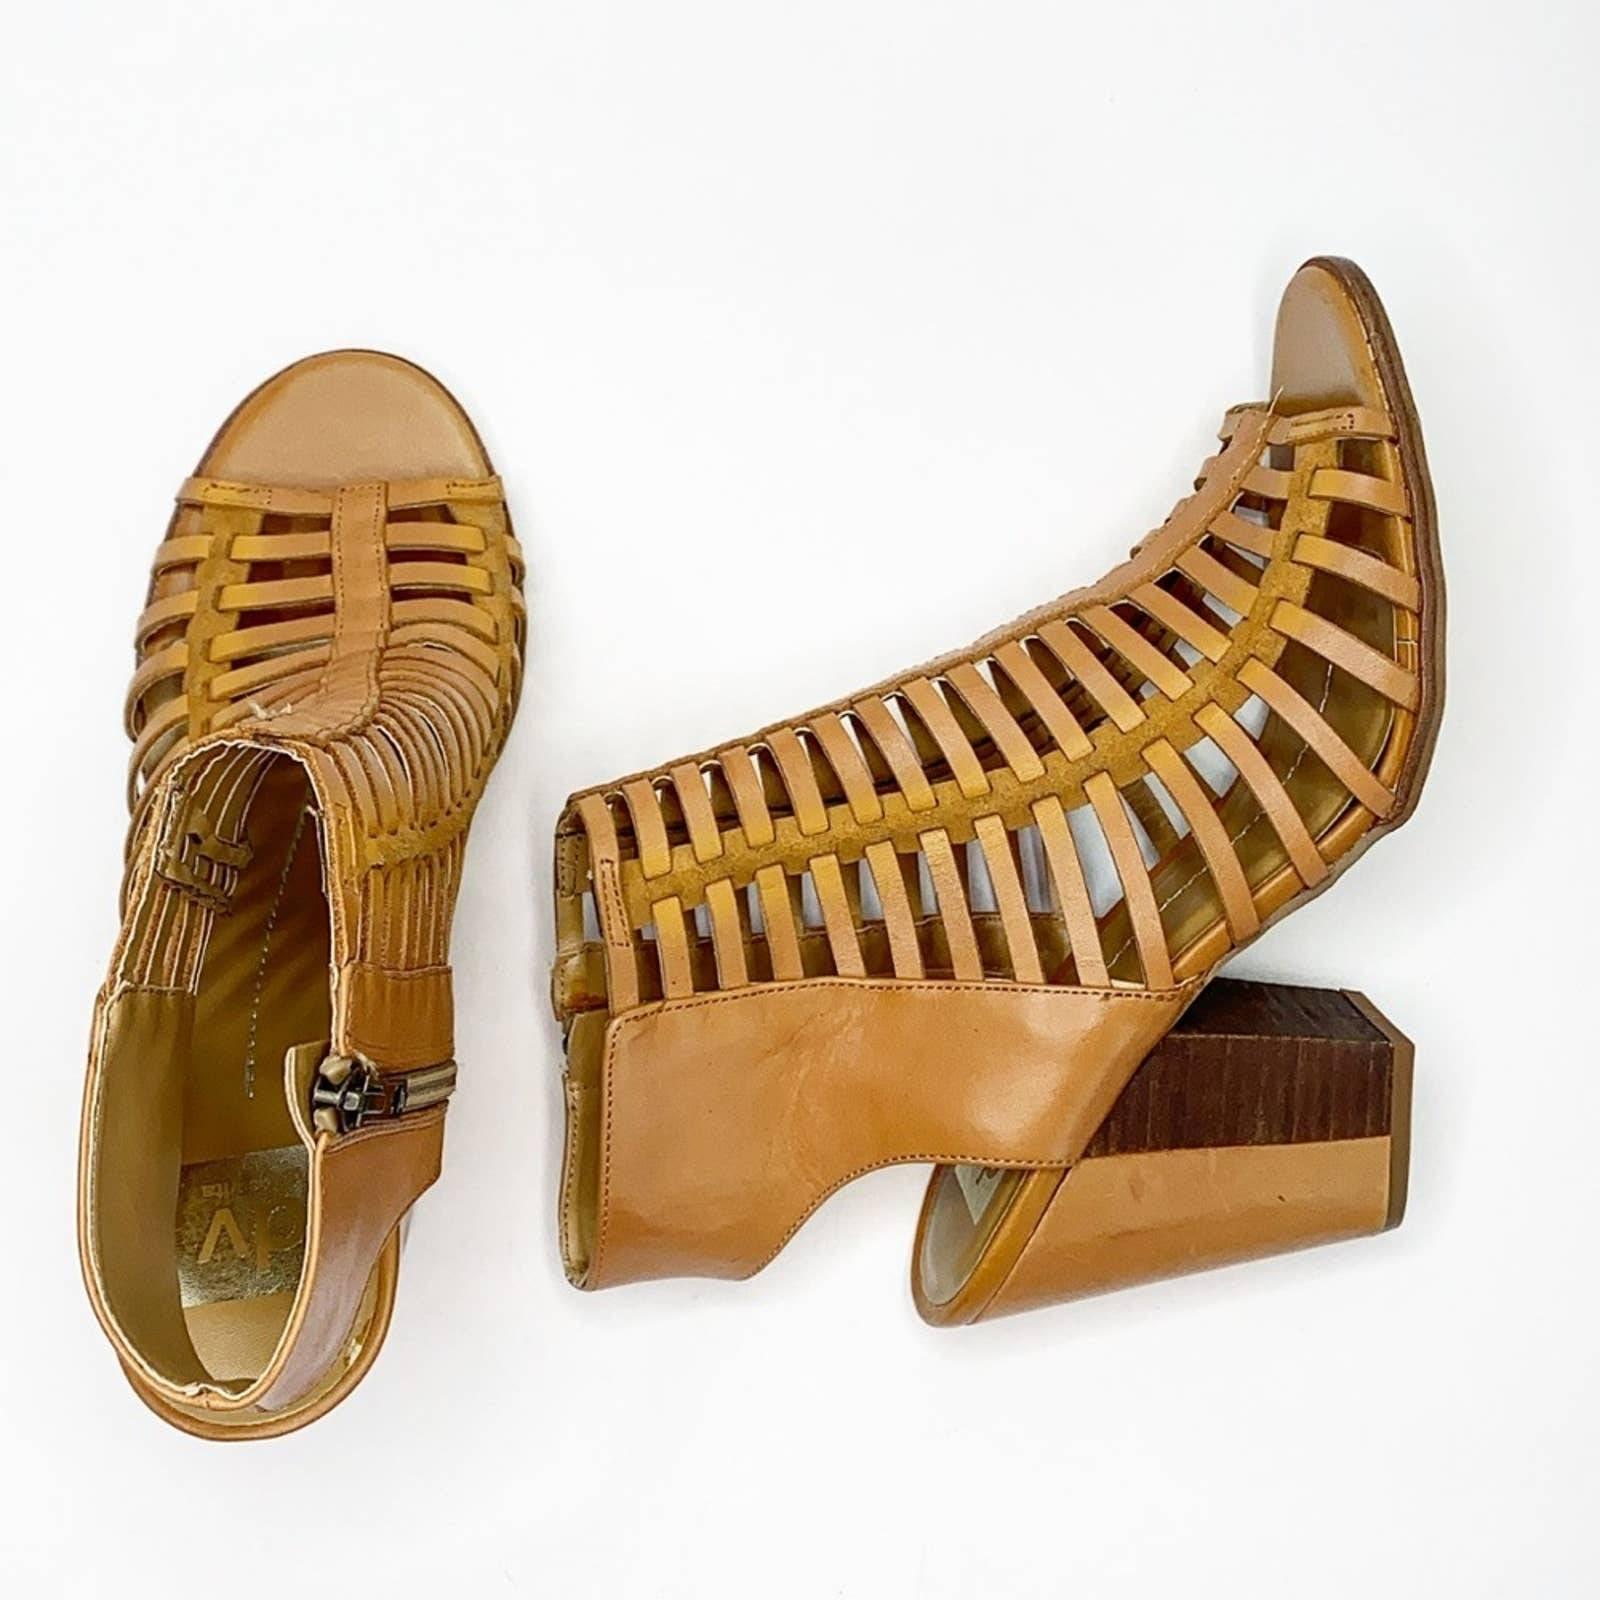 DV DOLCE VITA gladiator block heel shoes